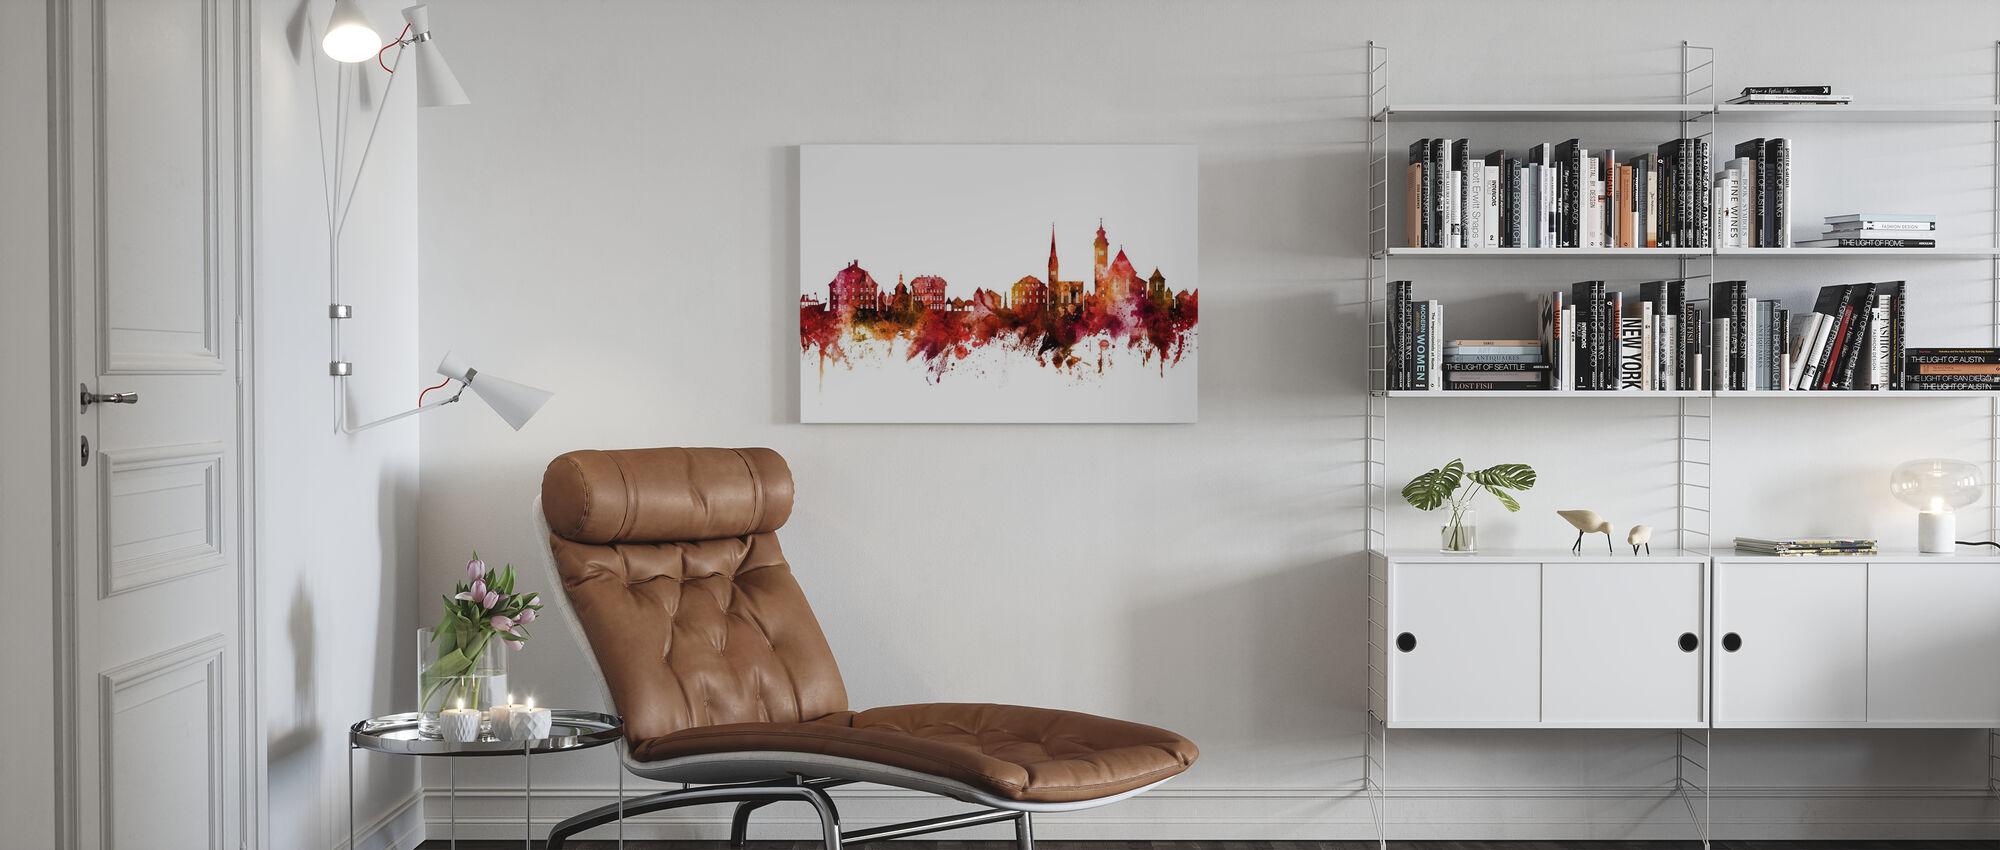 Hallstatt Austria Skyline - Canvas print - Living Room